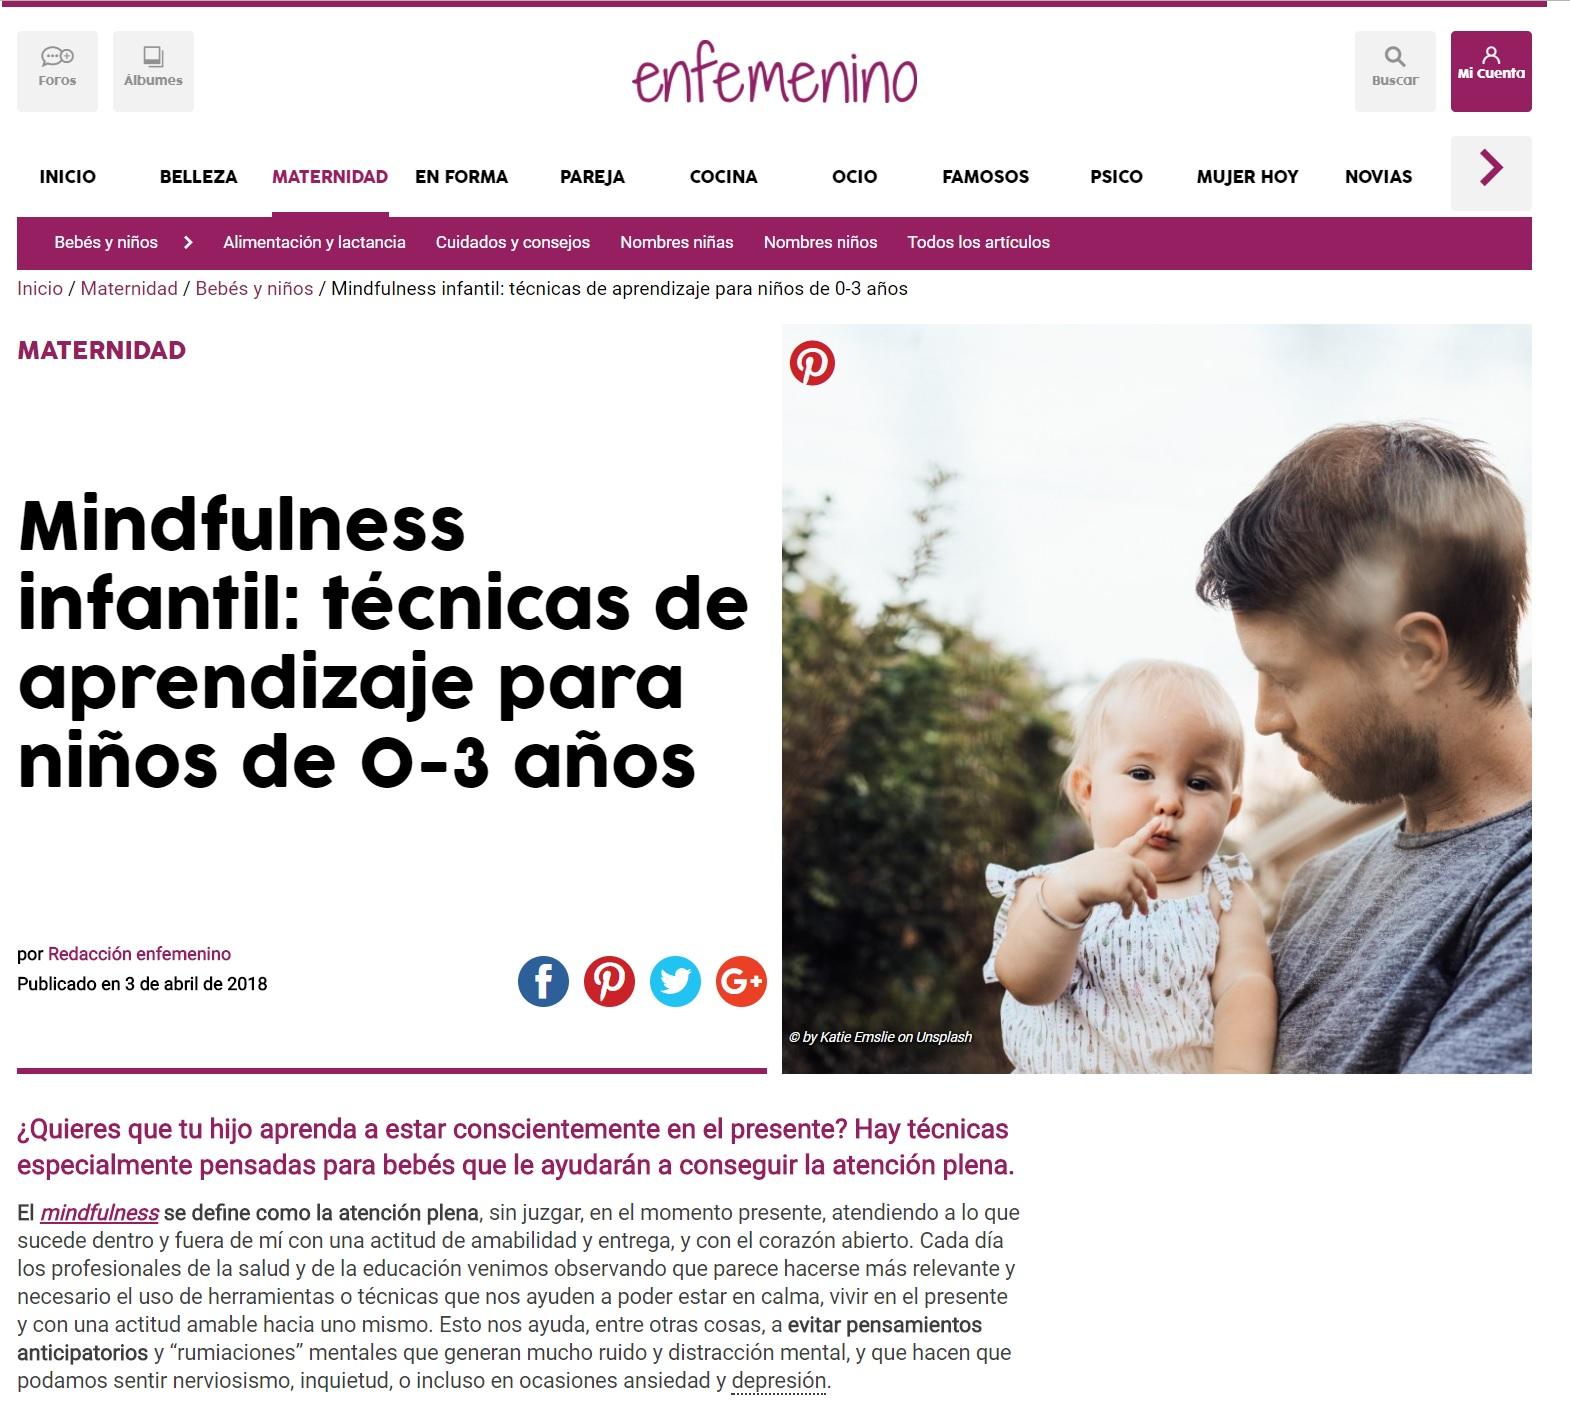 Mindfulness infantil tecnicas, artículo escuela infantil nemomarlin Majadahonda